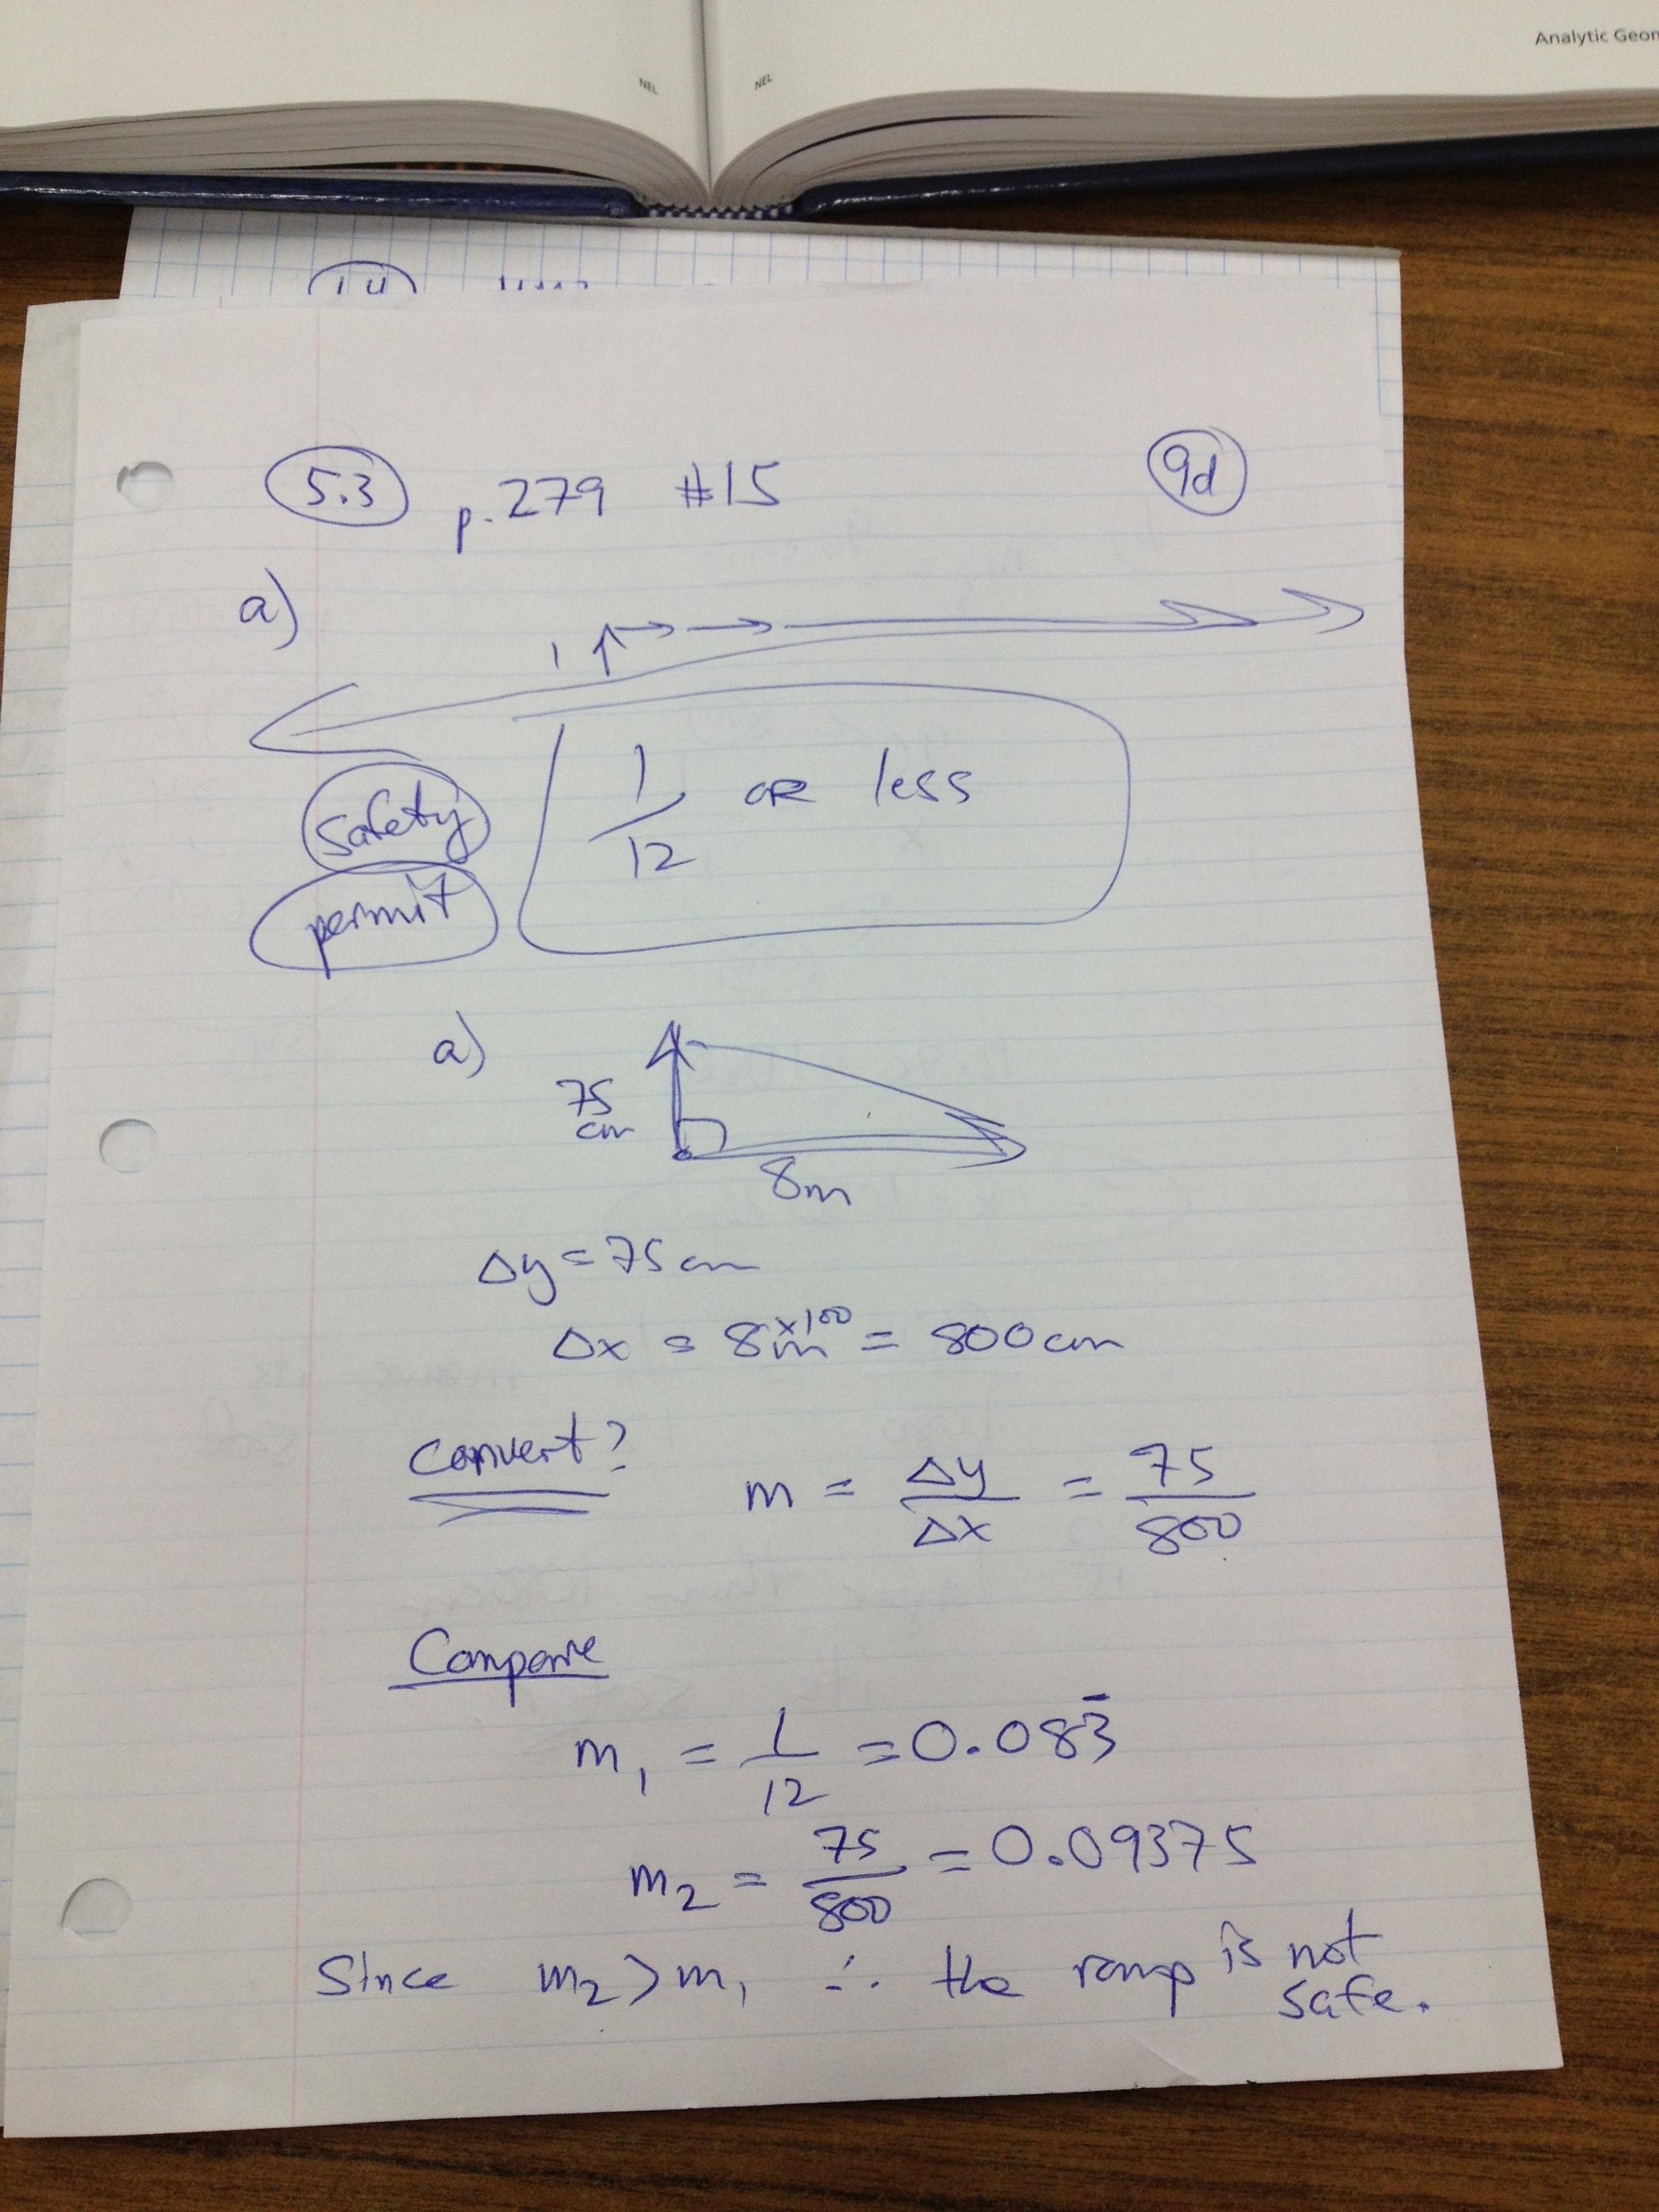 math worksheet : grade 9 academic math worksheets ontario  adding and subtracting  : Grade 9 Academic Math Worksheets